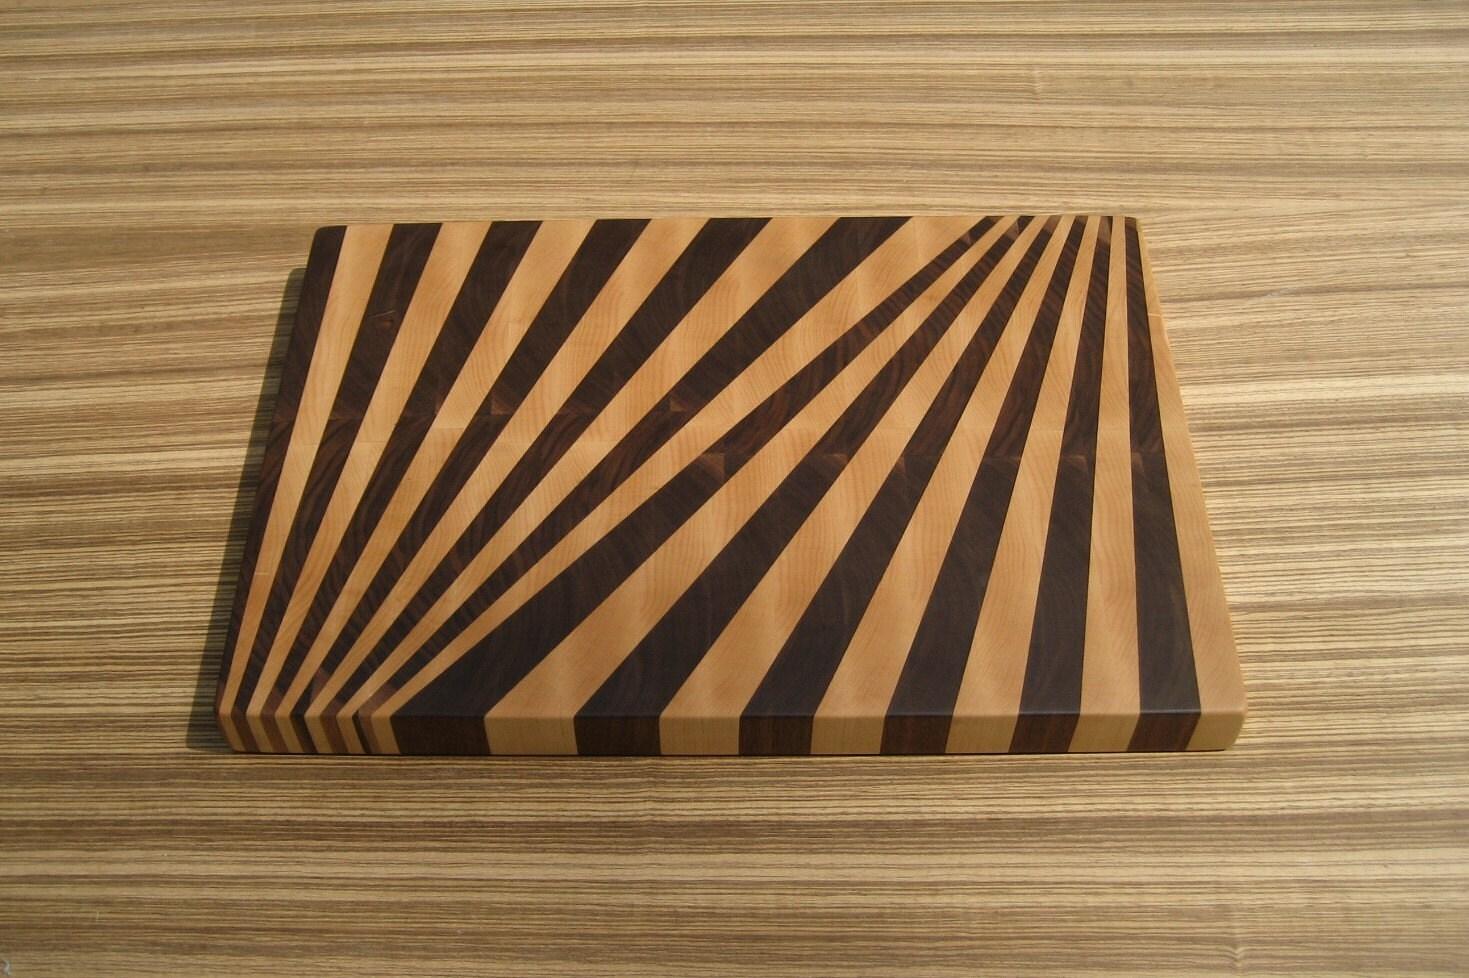 Cutting board patterns